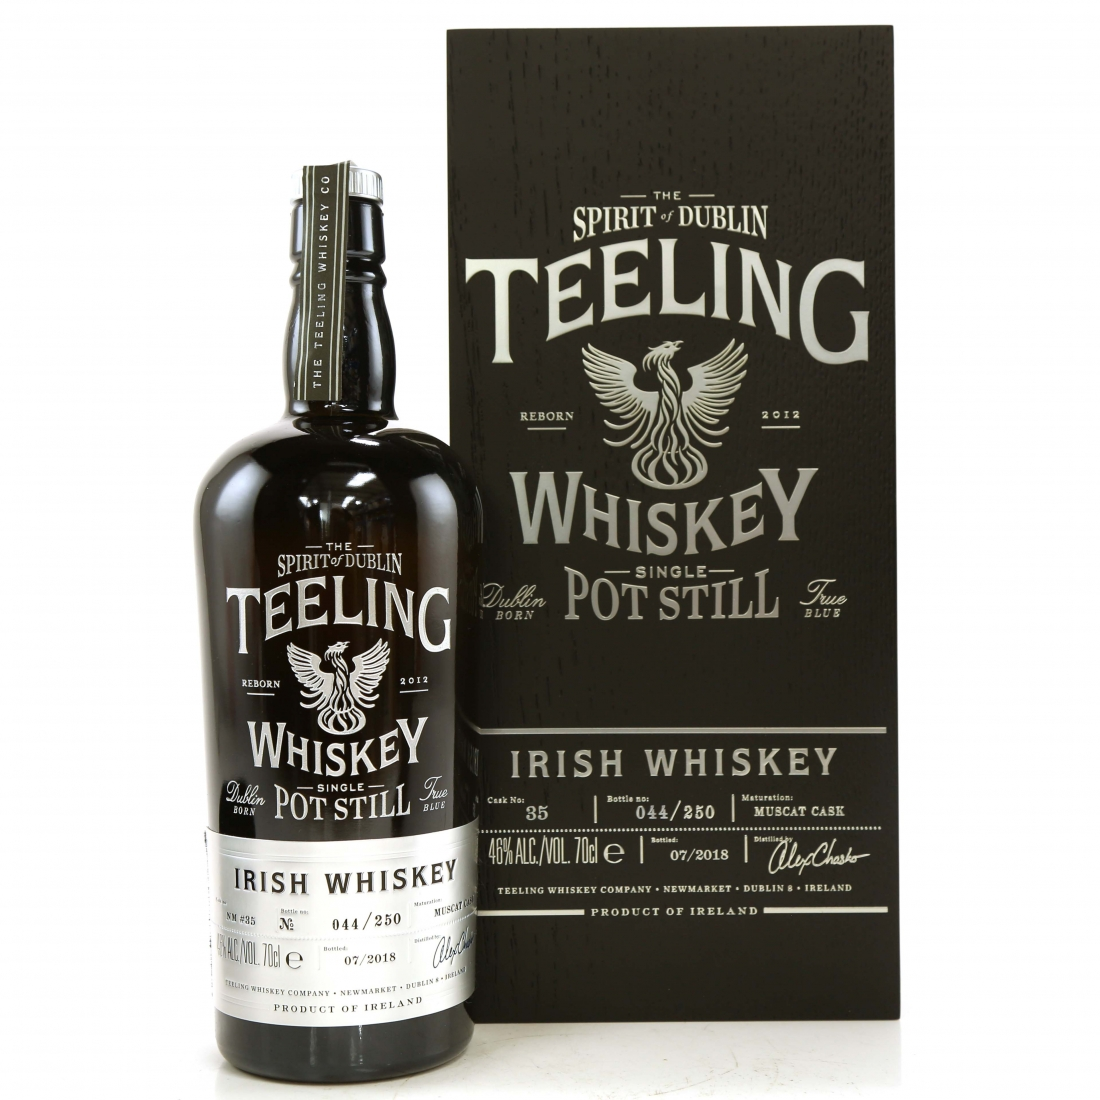 Teeling Celebratory Single Pot Still Whiskey / Bottle #044